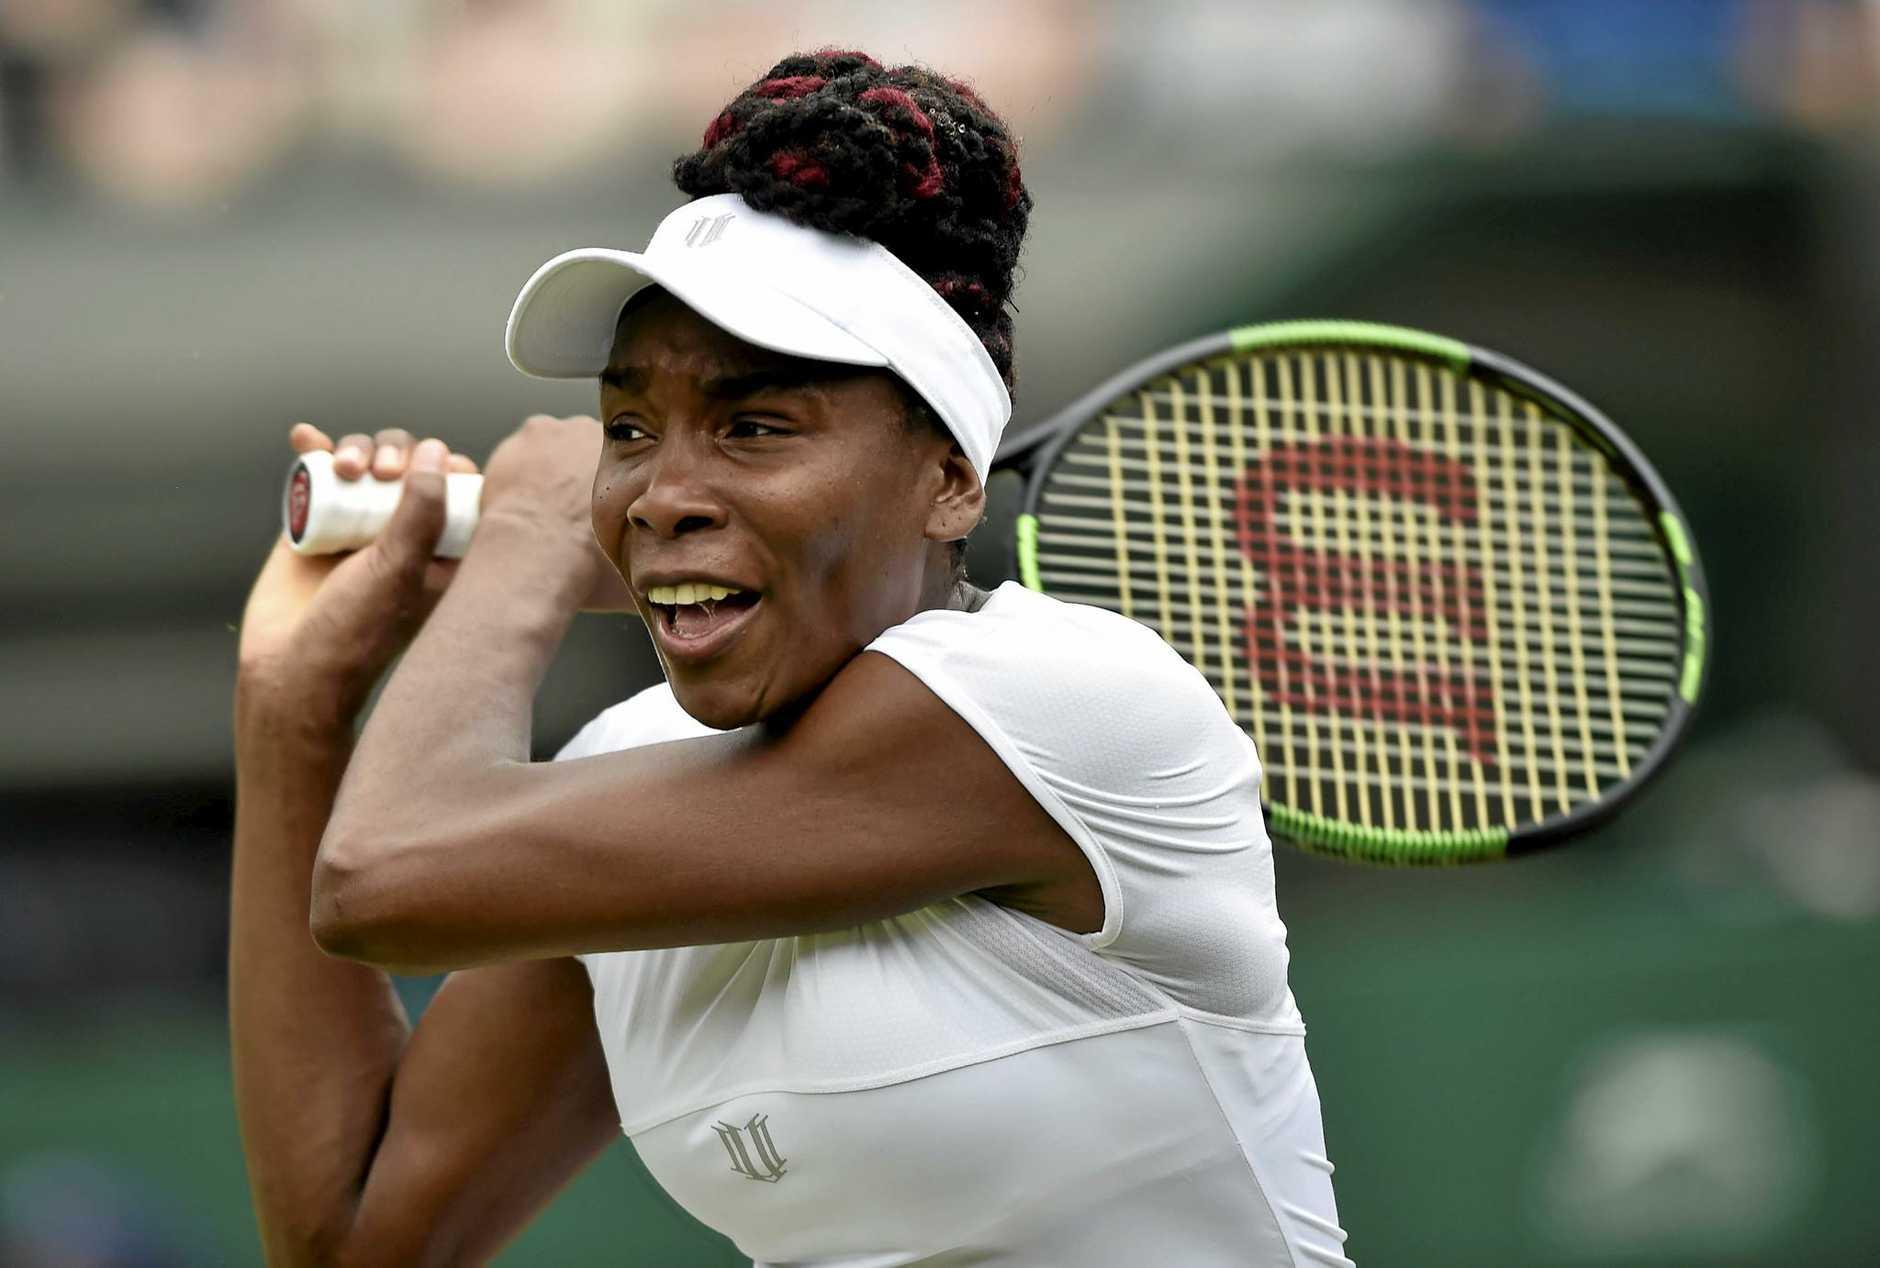 Venus Williams plays Yaroslava Shvedova in their quarter final match at the All England Lawn Tennis Club in London.